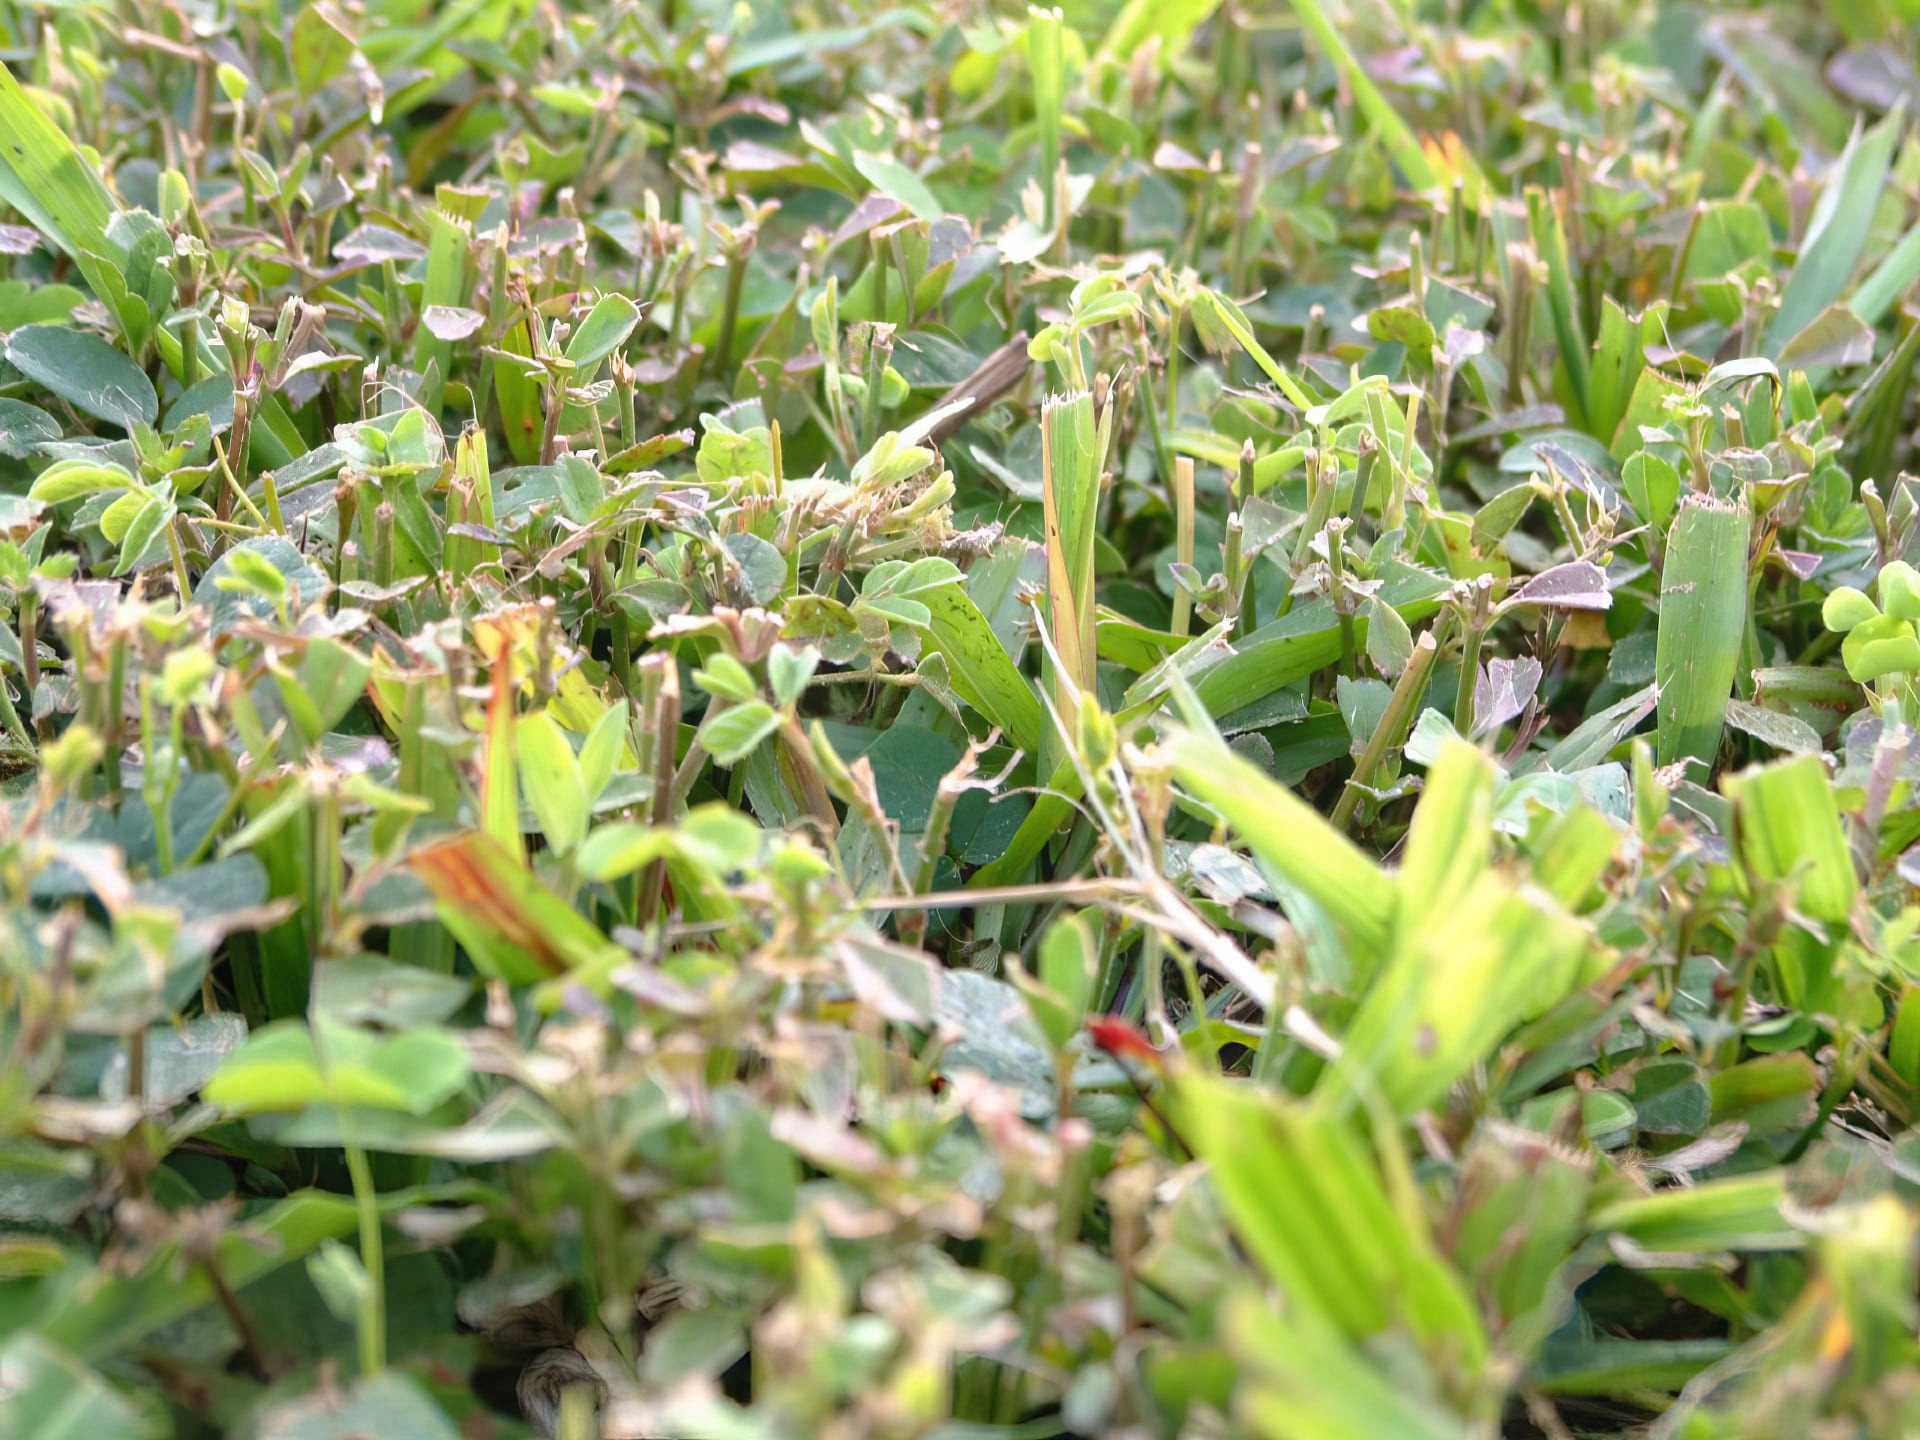 Hardened grass